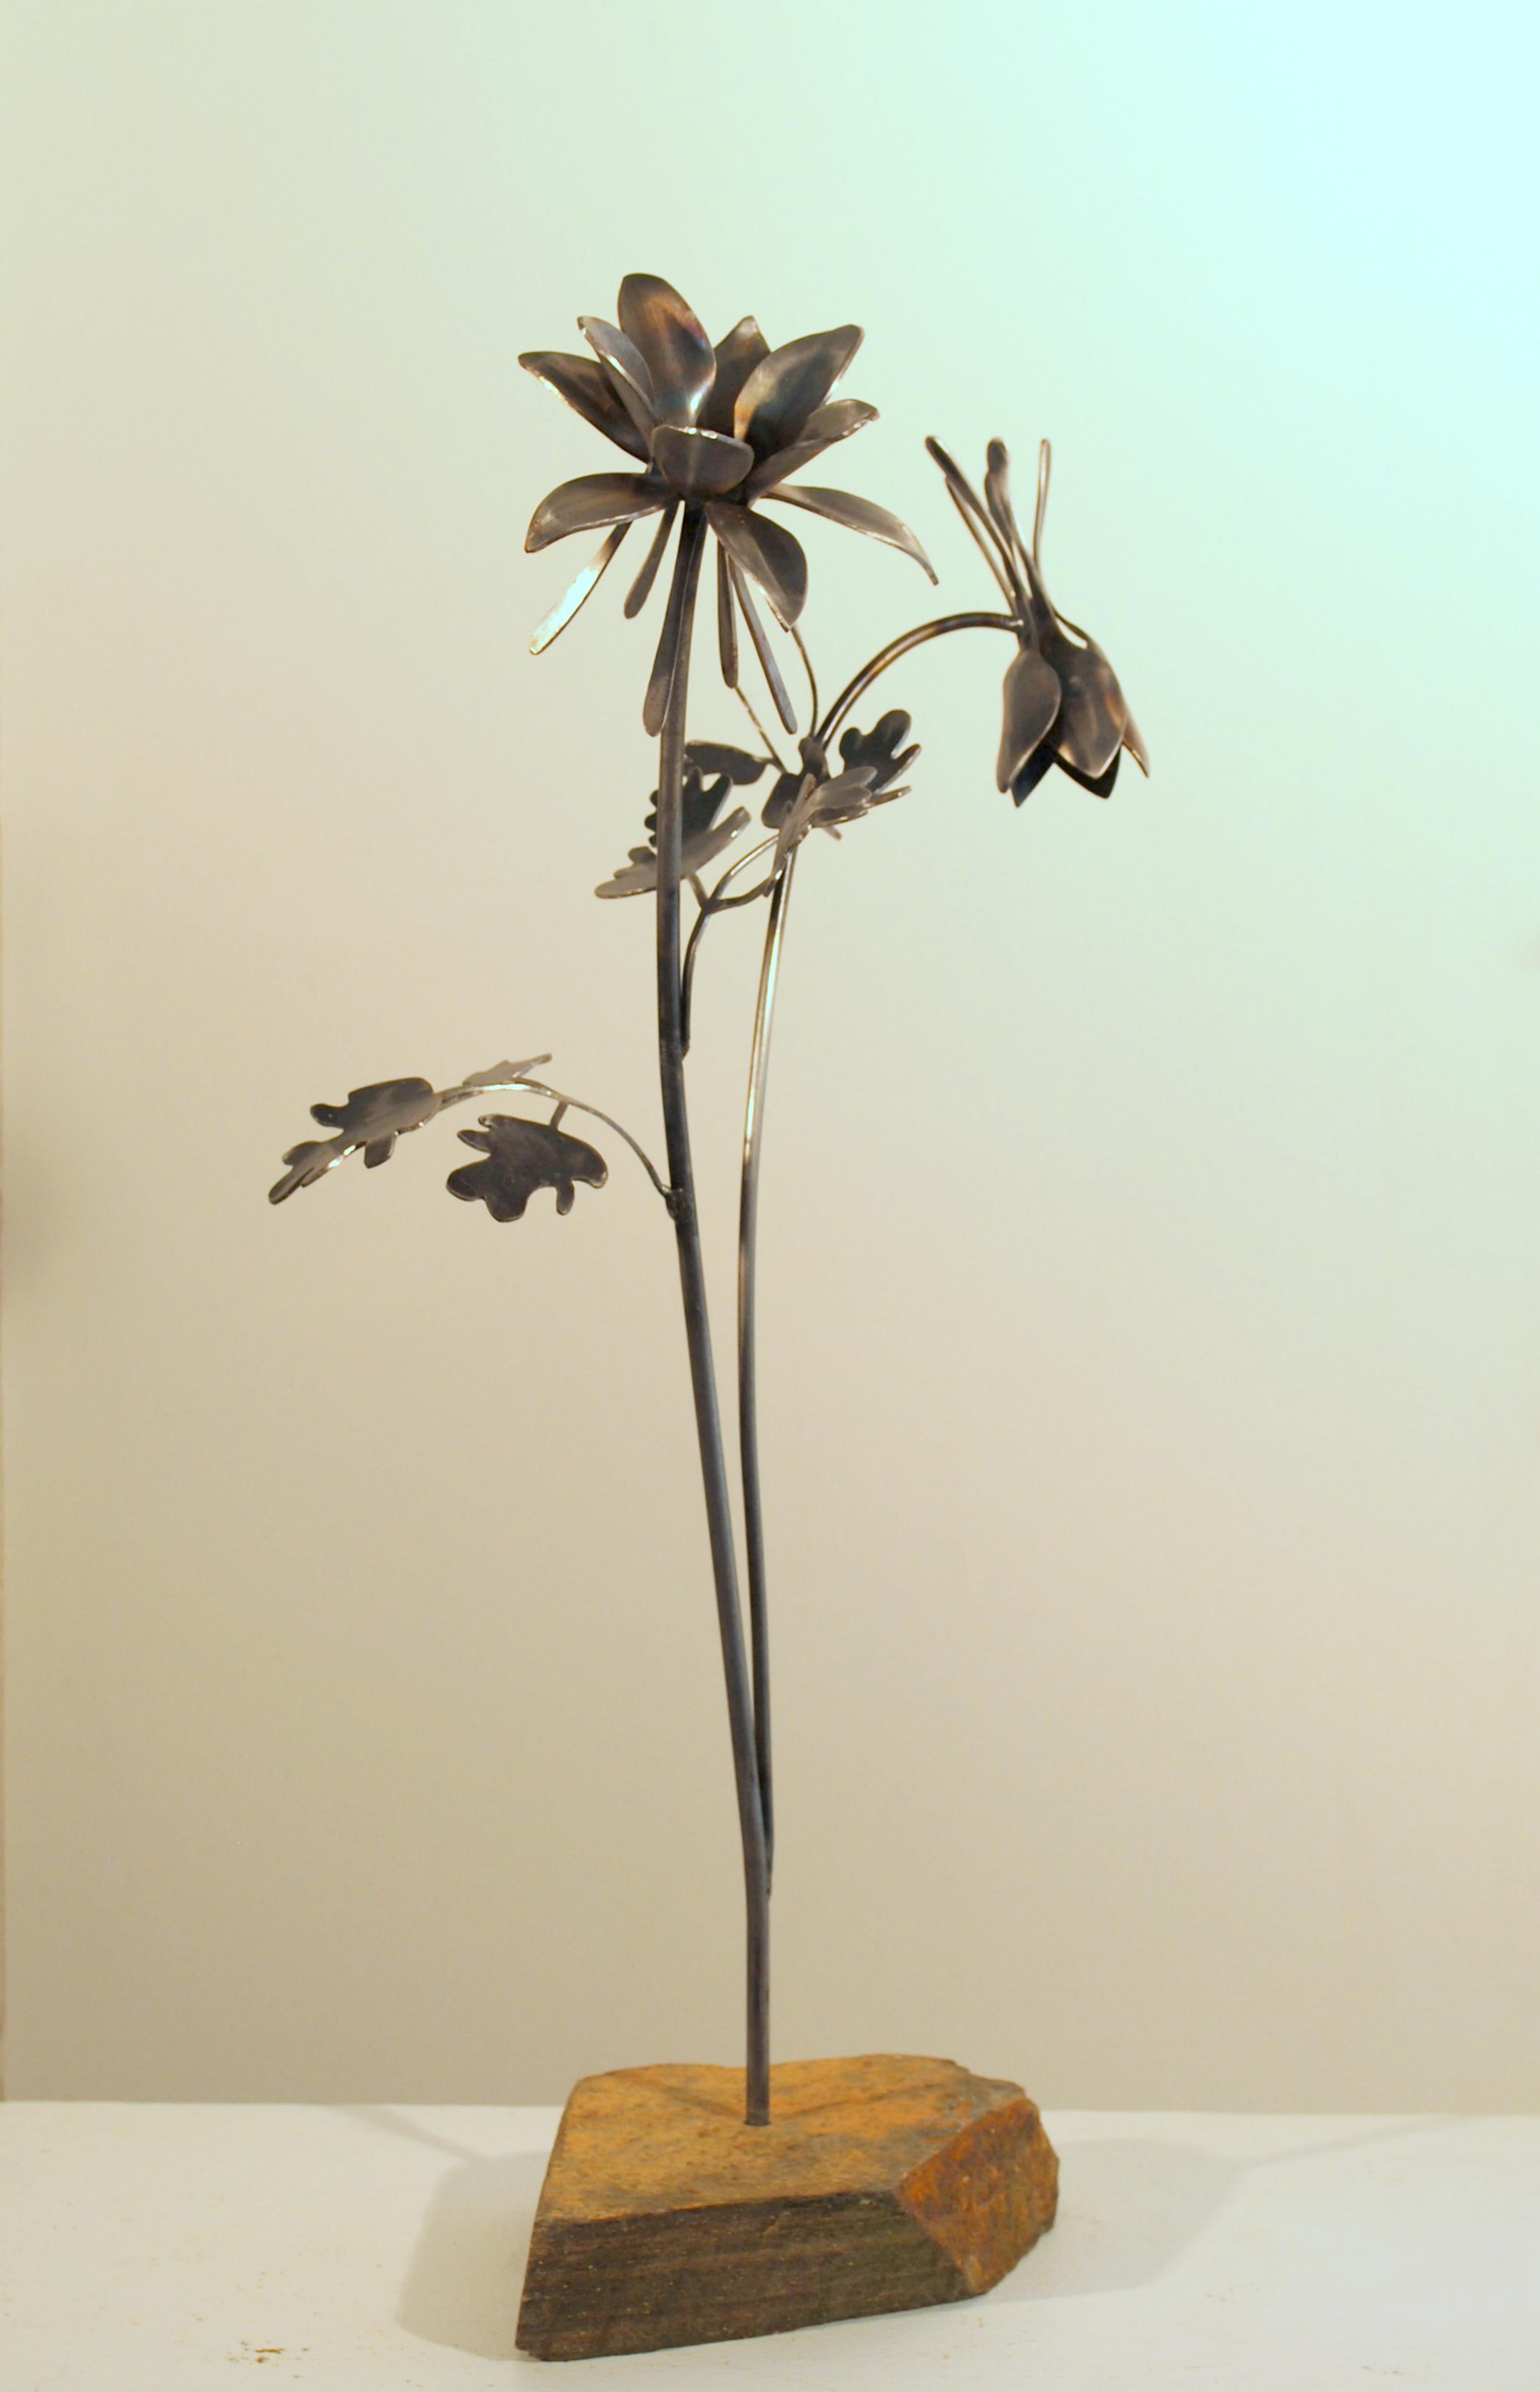 Iris at Art on a Whim Gallery (8).JPG